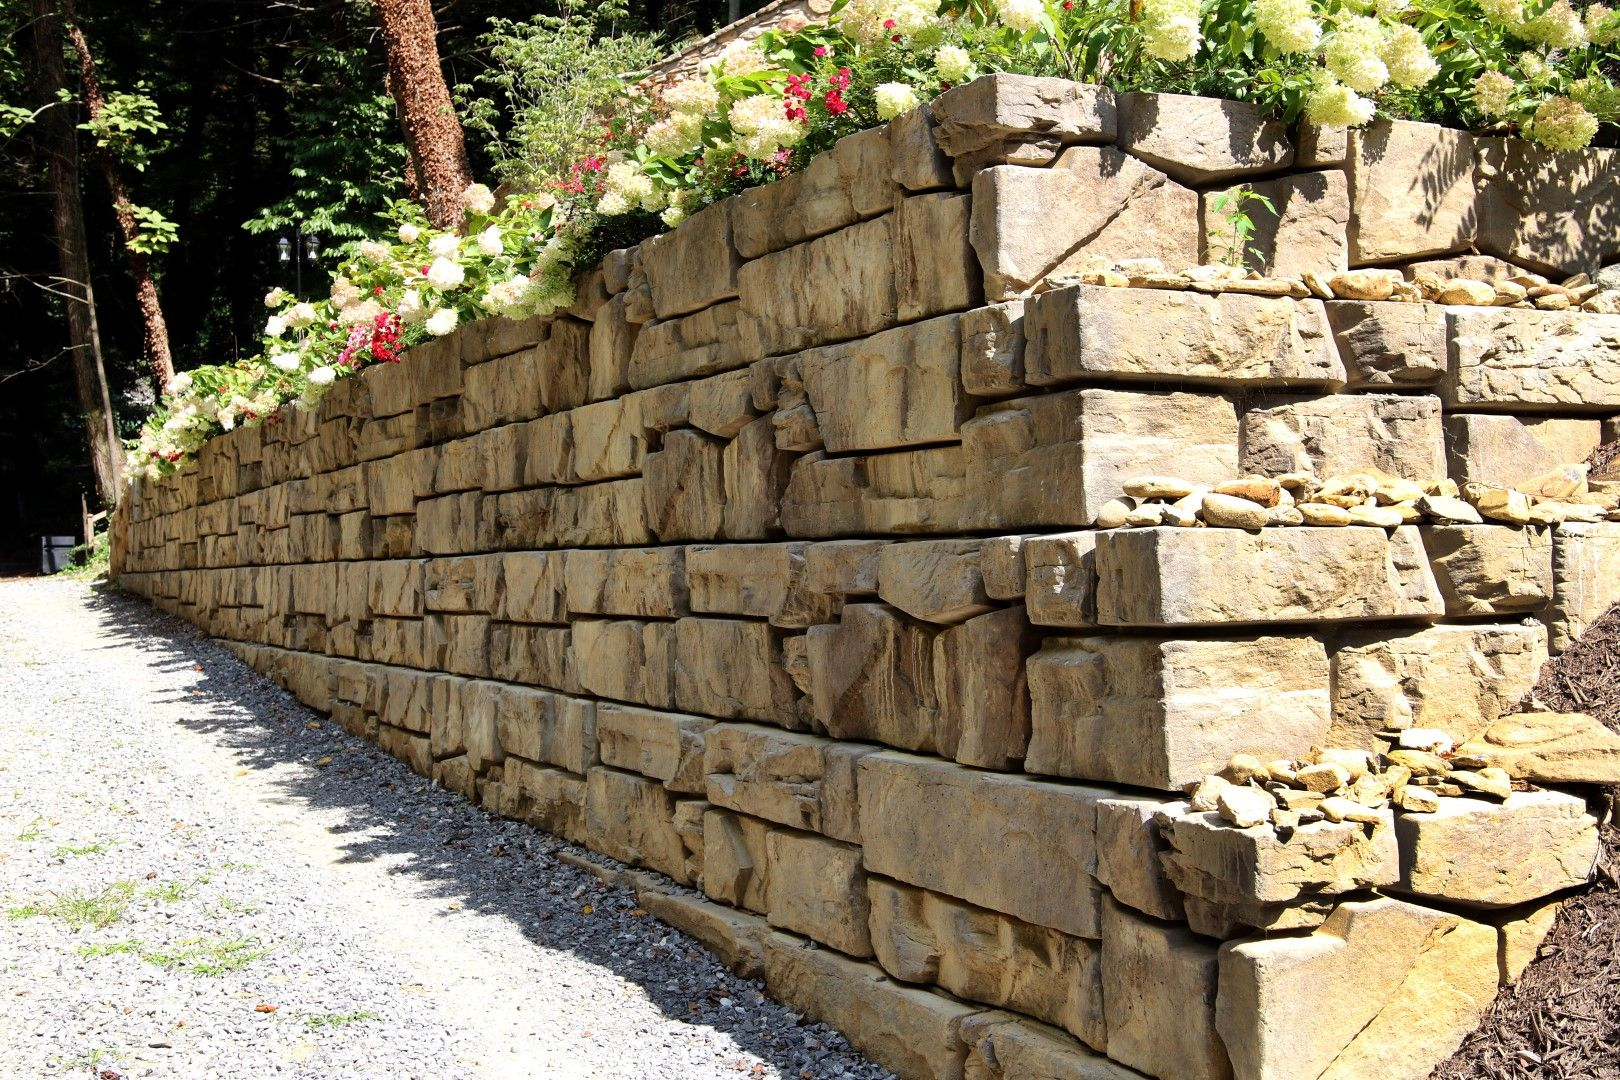 Verti Block Retaining Wall Retaining Wall Construction Wall Systems